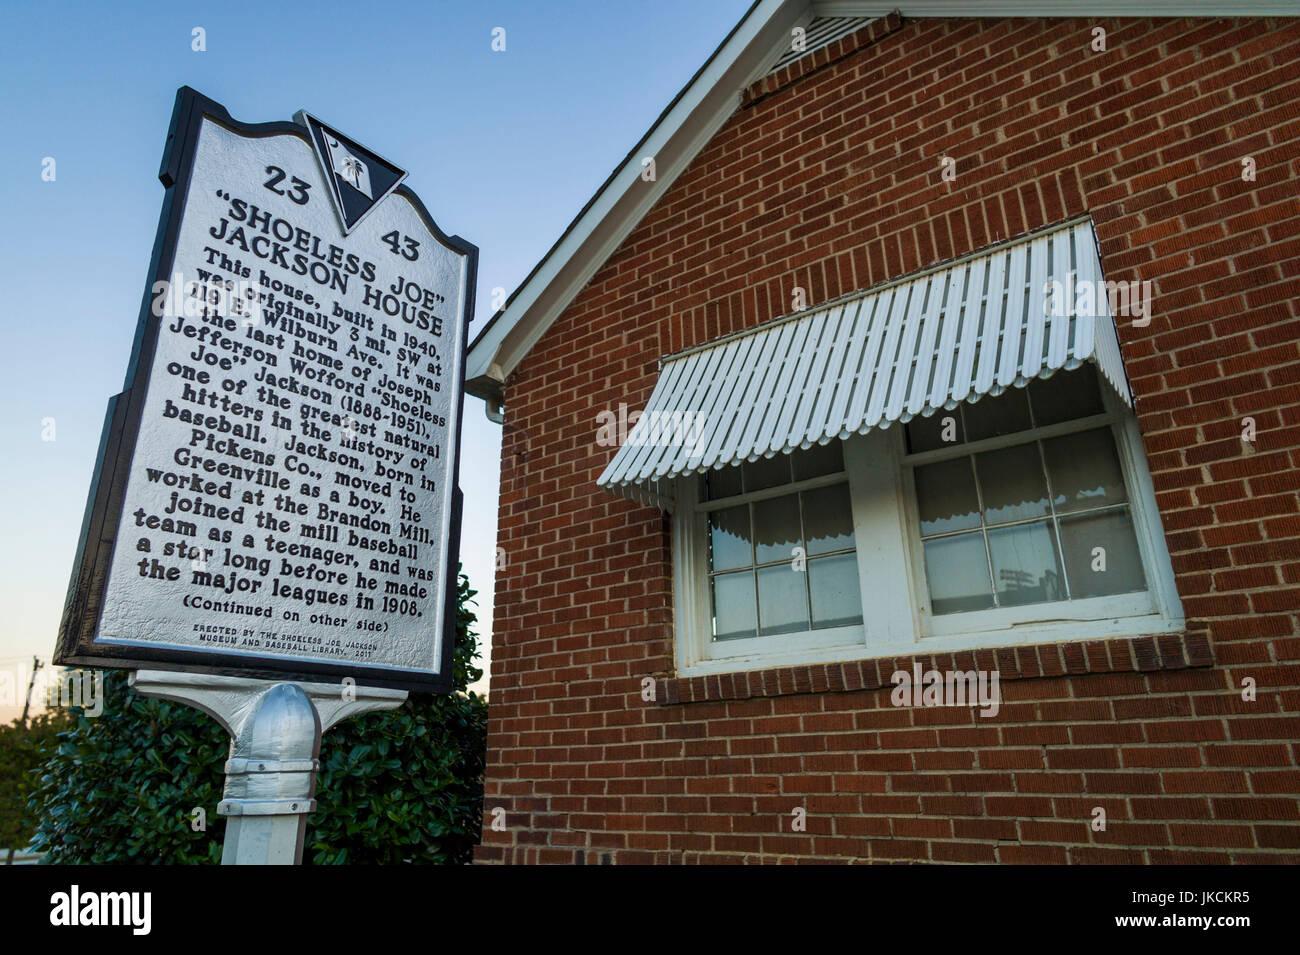 USA, South Carolina, Greenville, Shoeless Joe Jackson Museum and Baseball Library, former home of Baseball legend - Stock Image